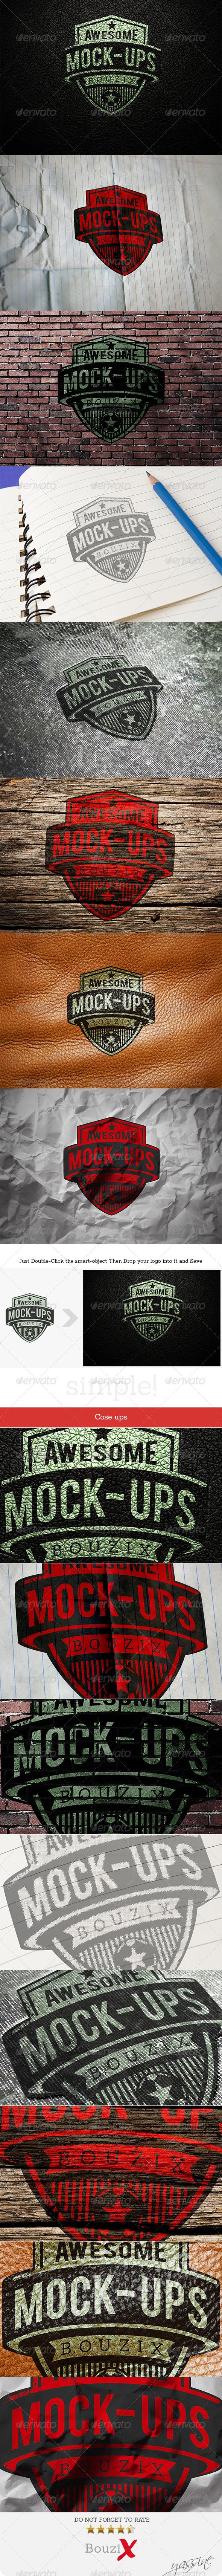 GraphicRiver Photorealistic Logo Mockups V.1 6855523